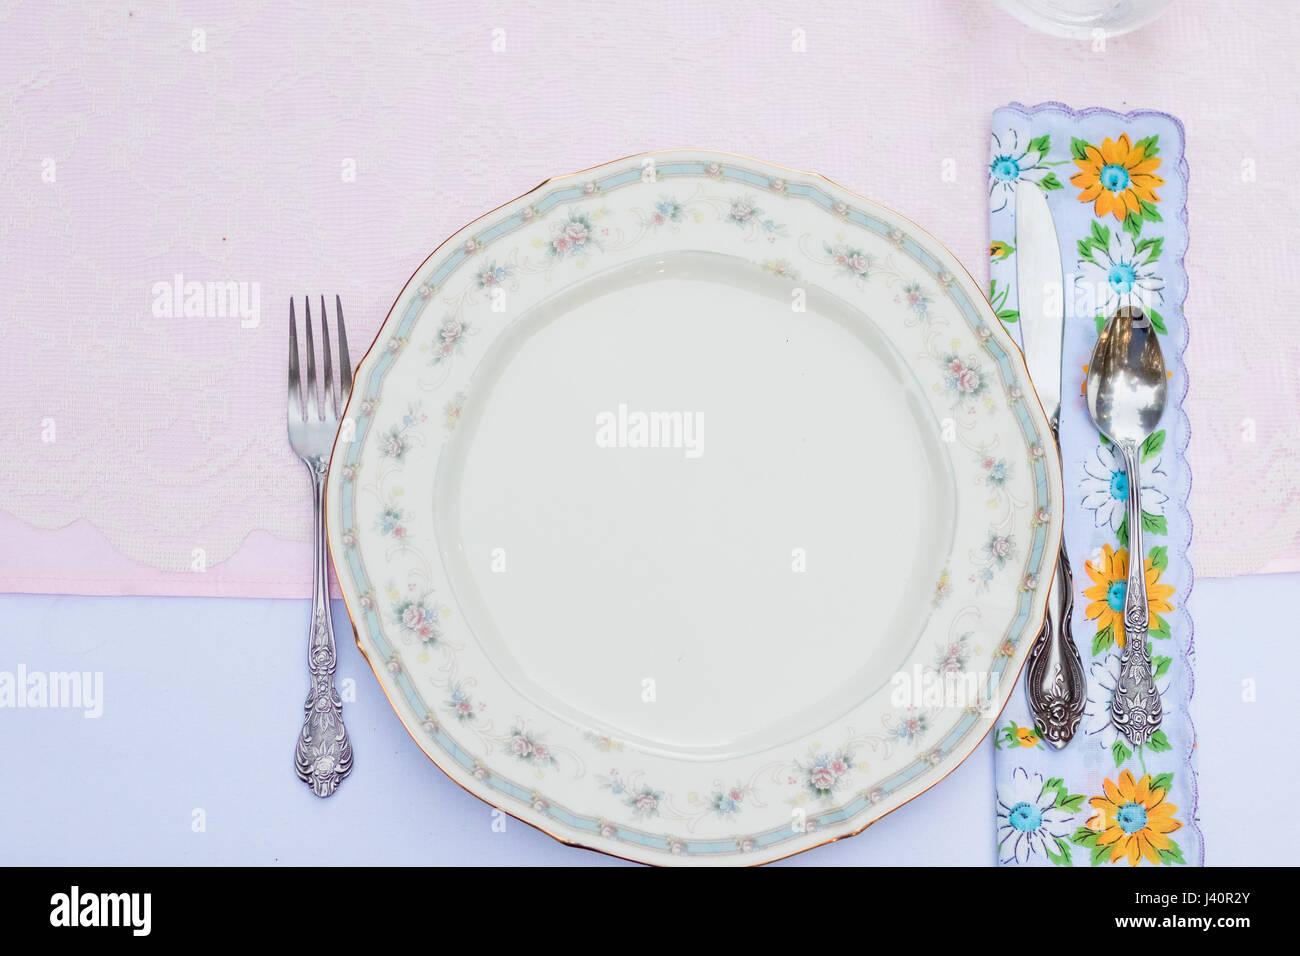 Antique Wedding Reception Plates